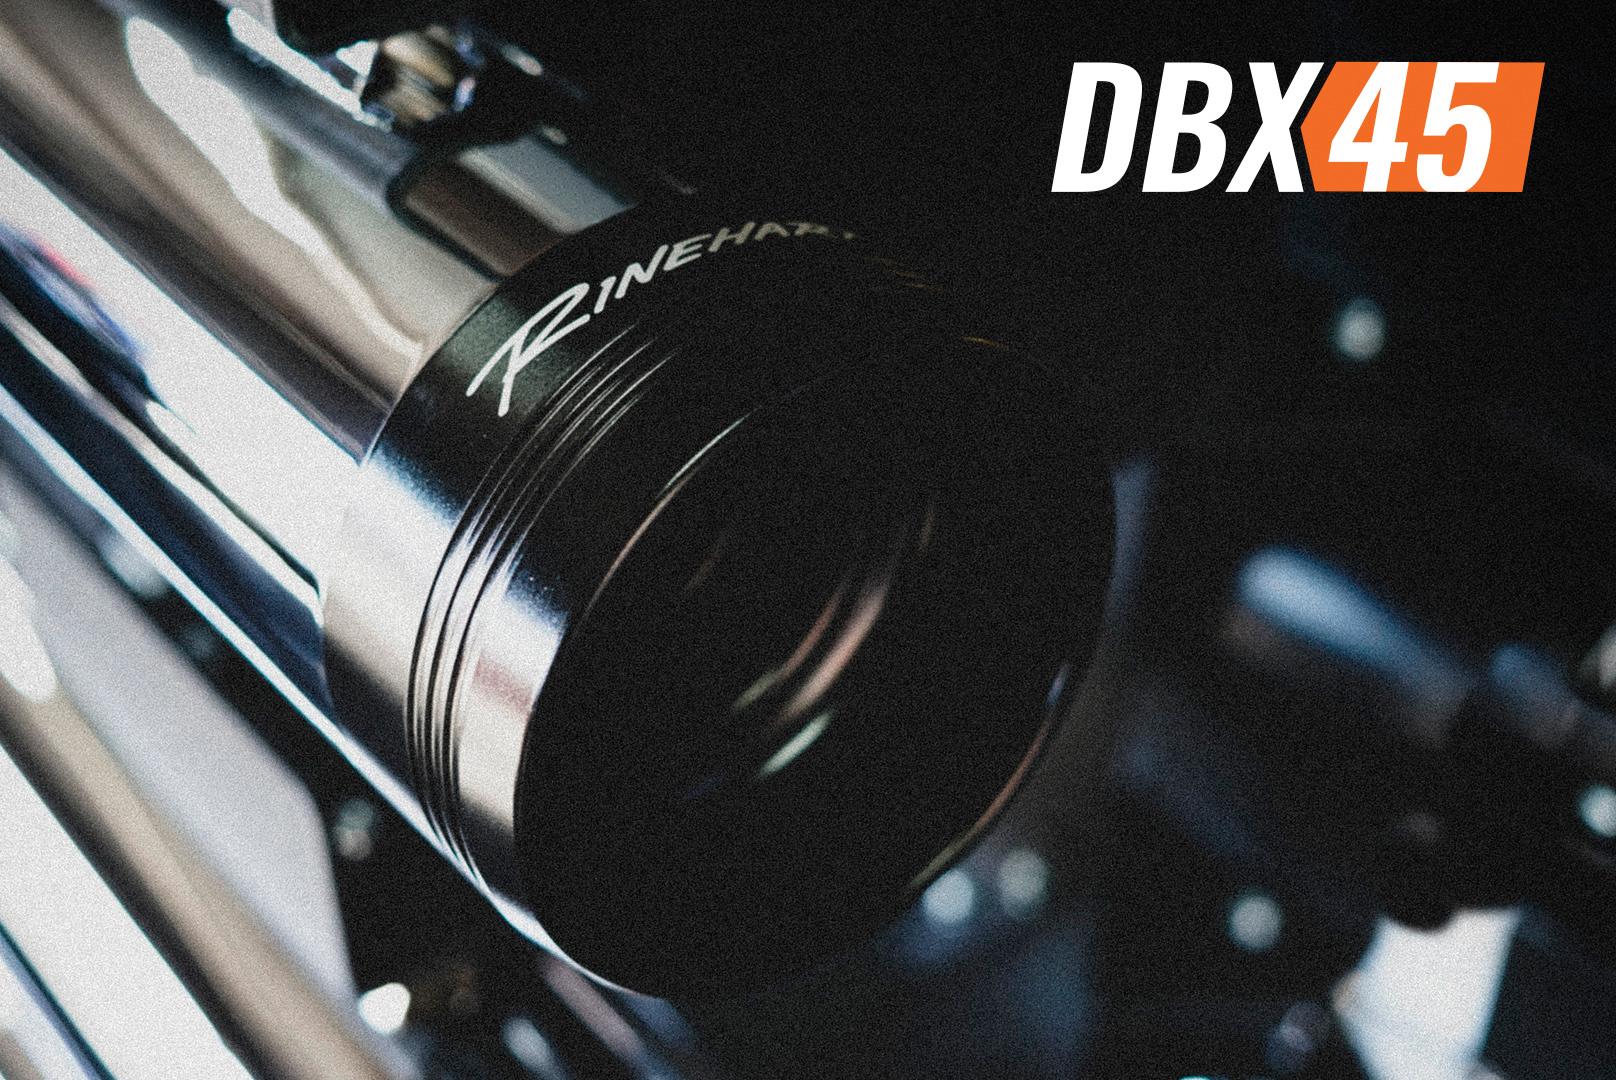 harley davidson new dbx45 slip on exhaust